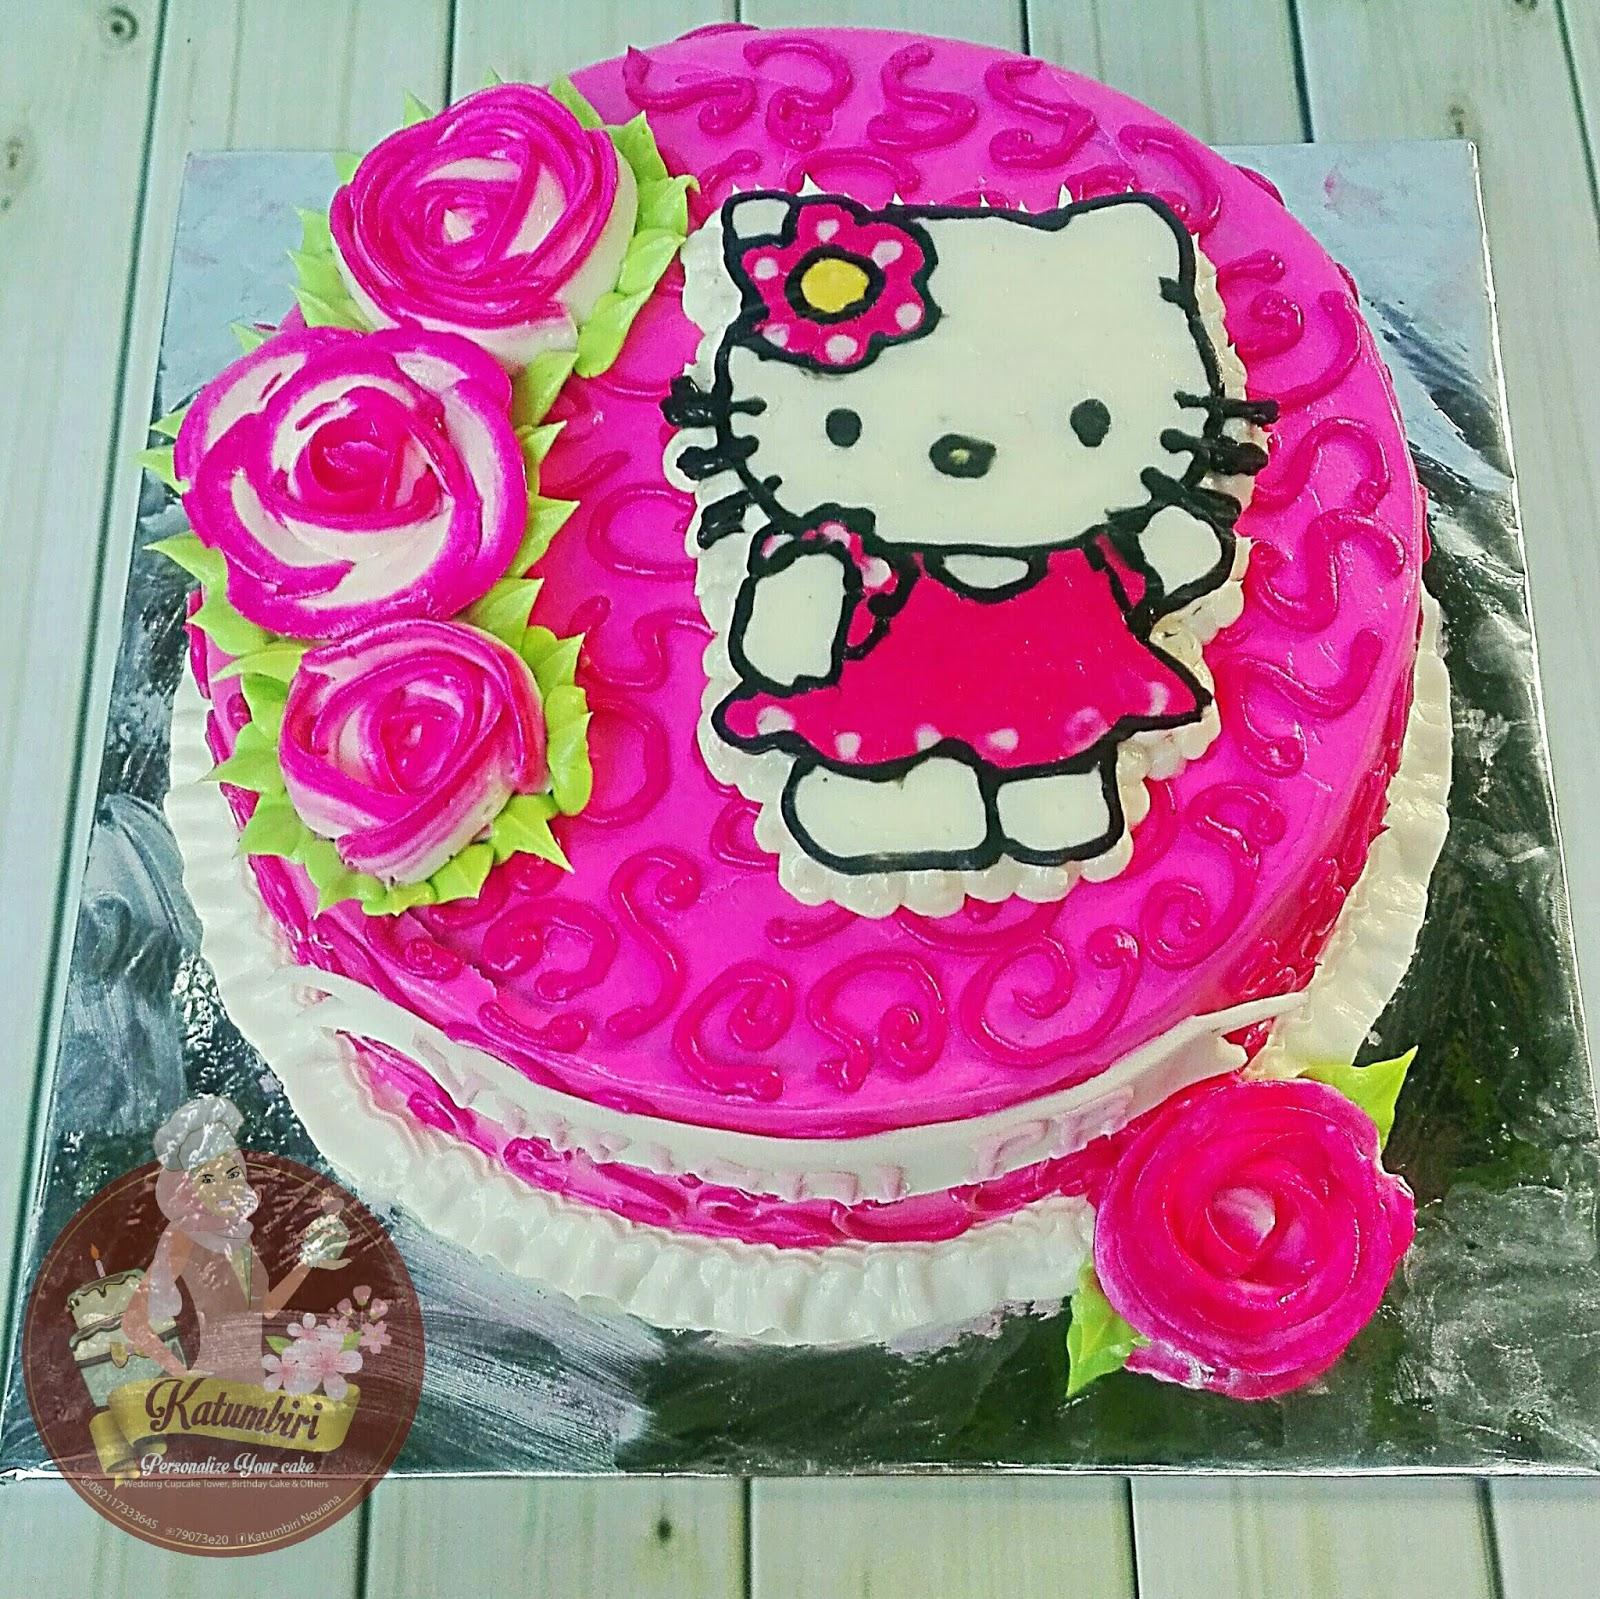 Katumbiri Custom Cake Cianjur Hello Kitty Buttercream Cake